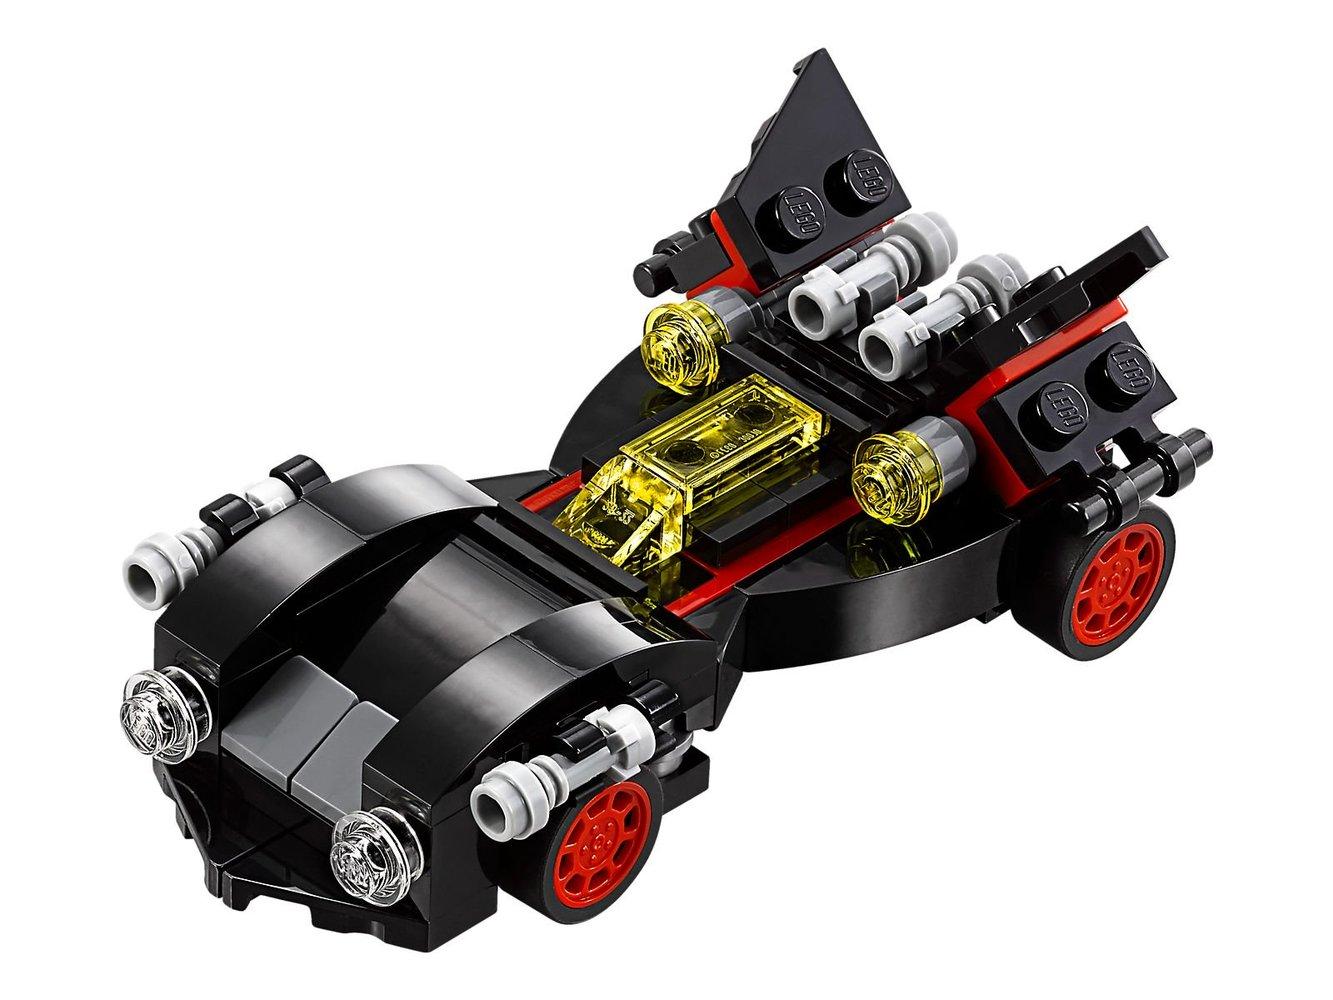 The Mini Ultimate Batmobile